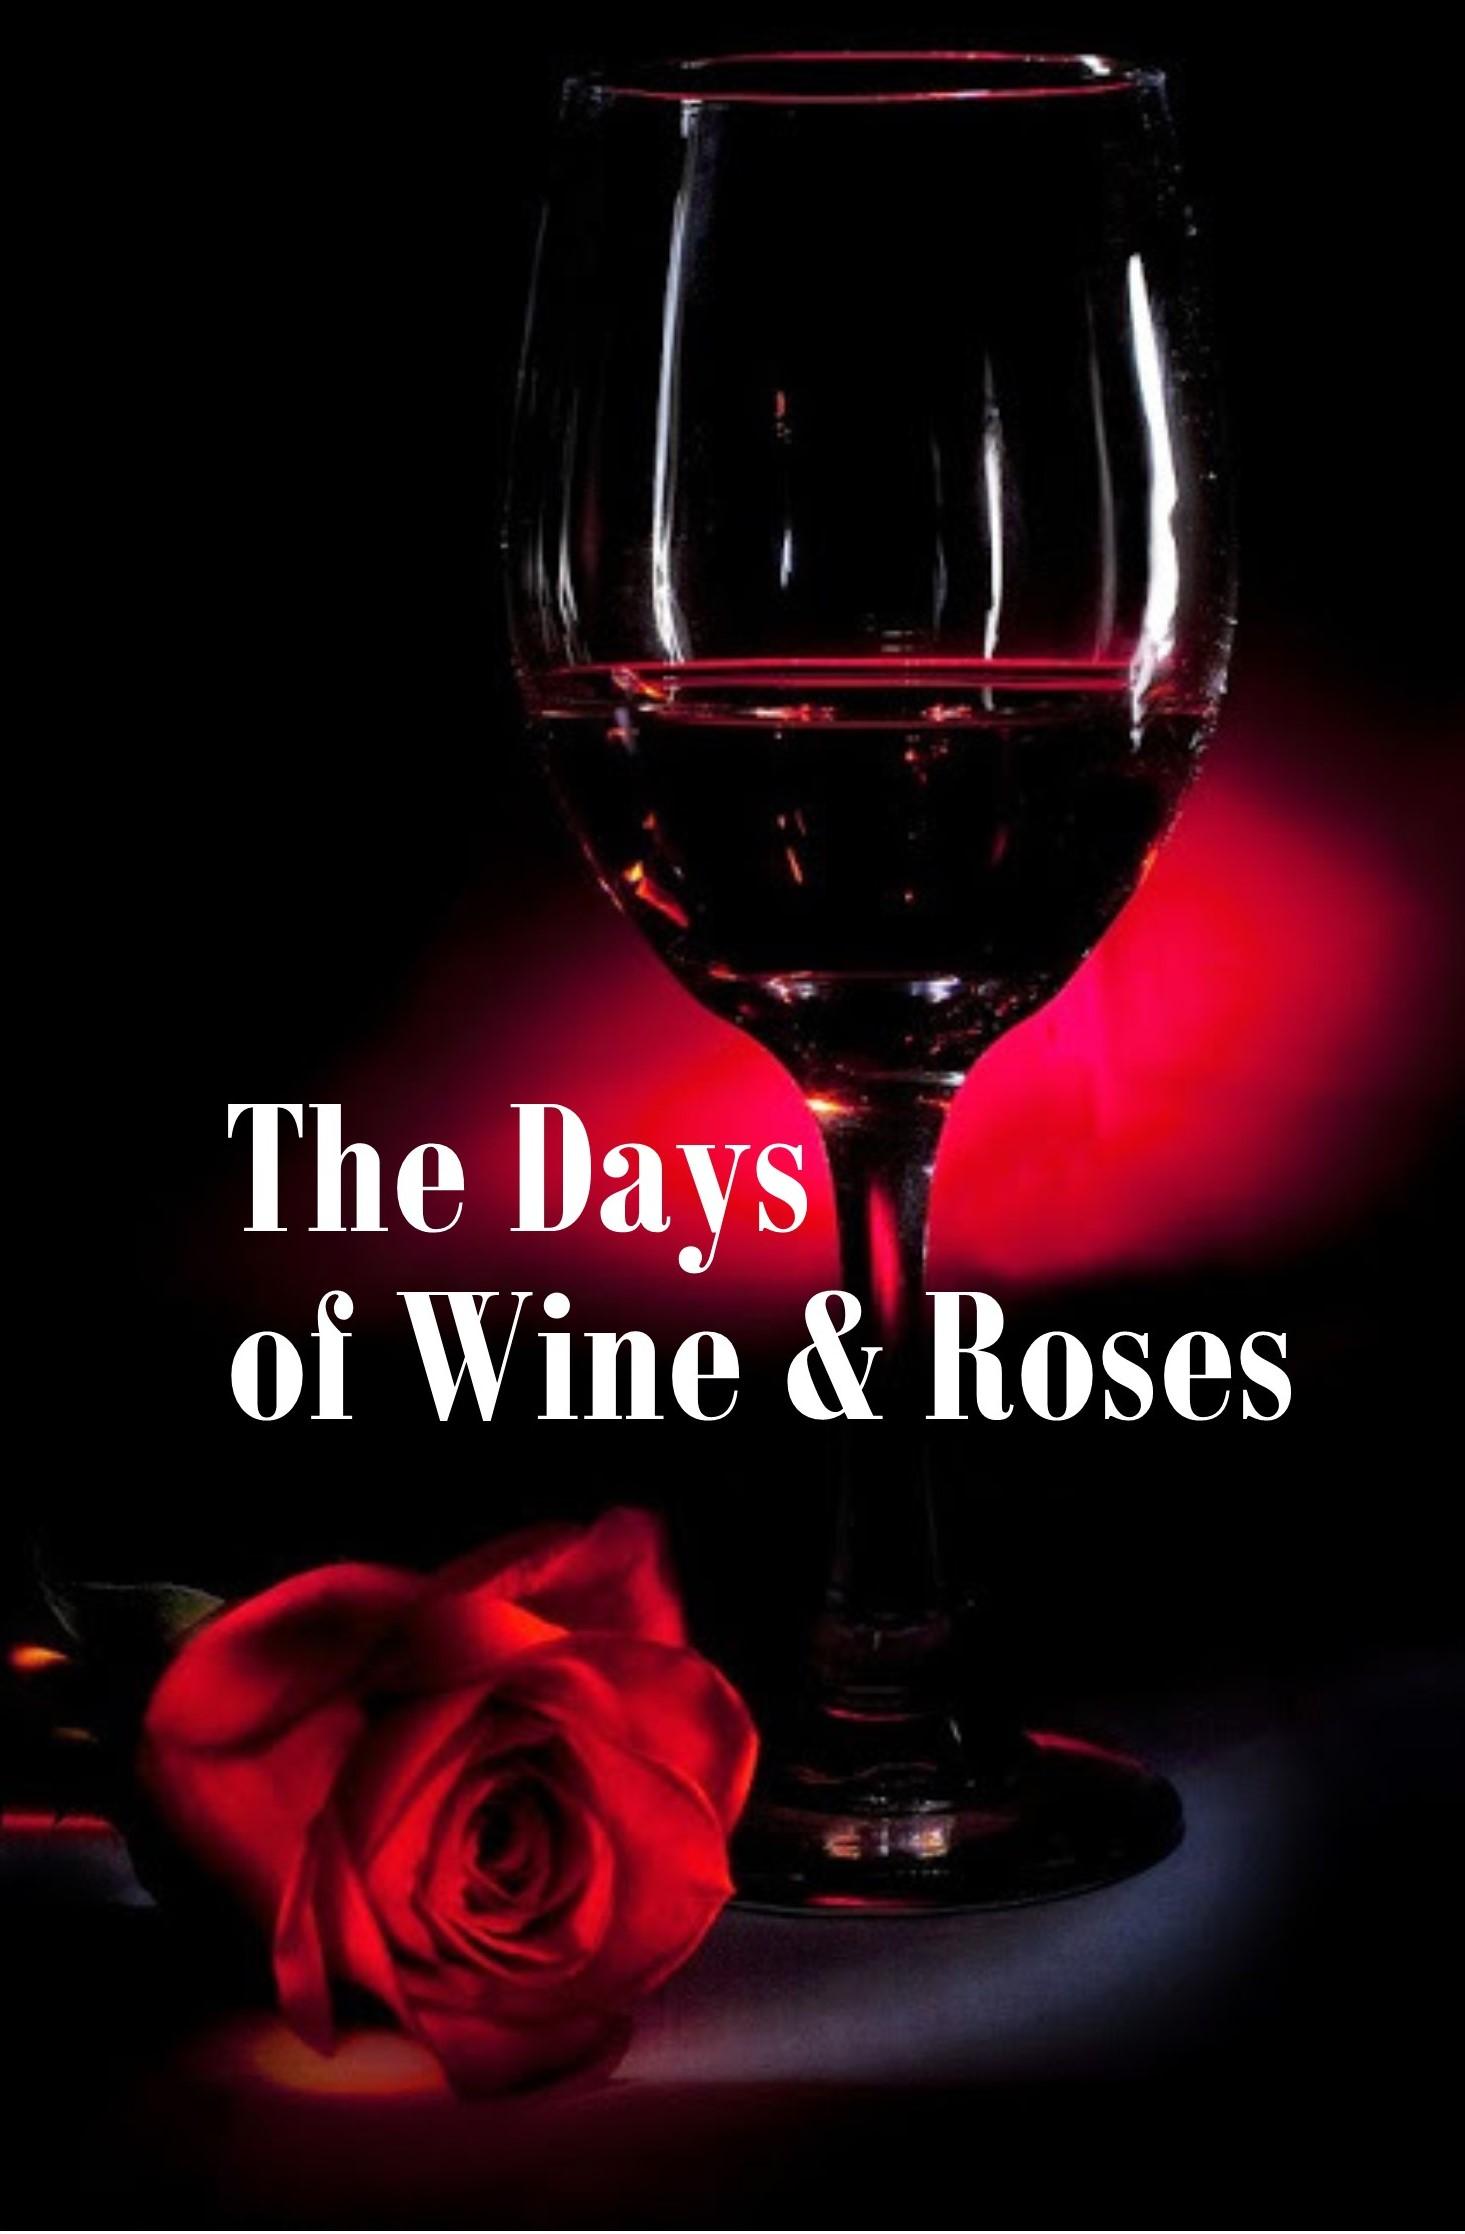 wine-n-roses-logo